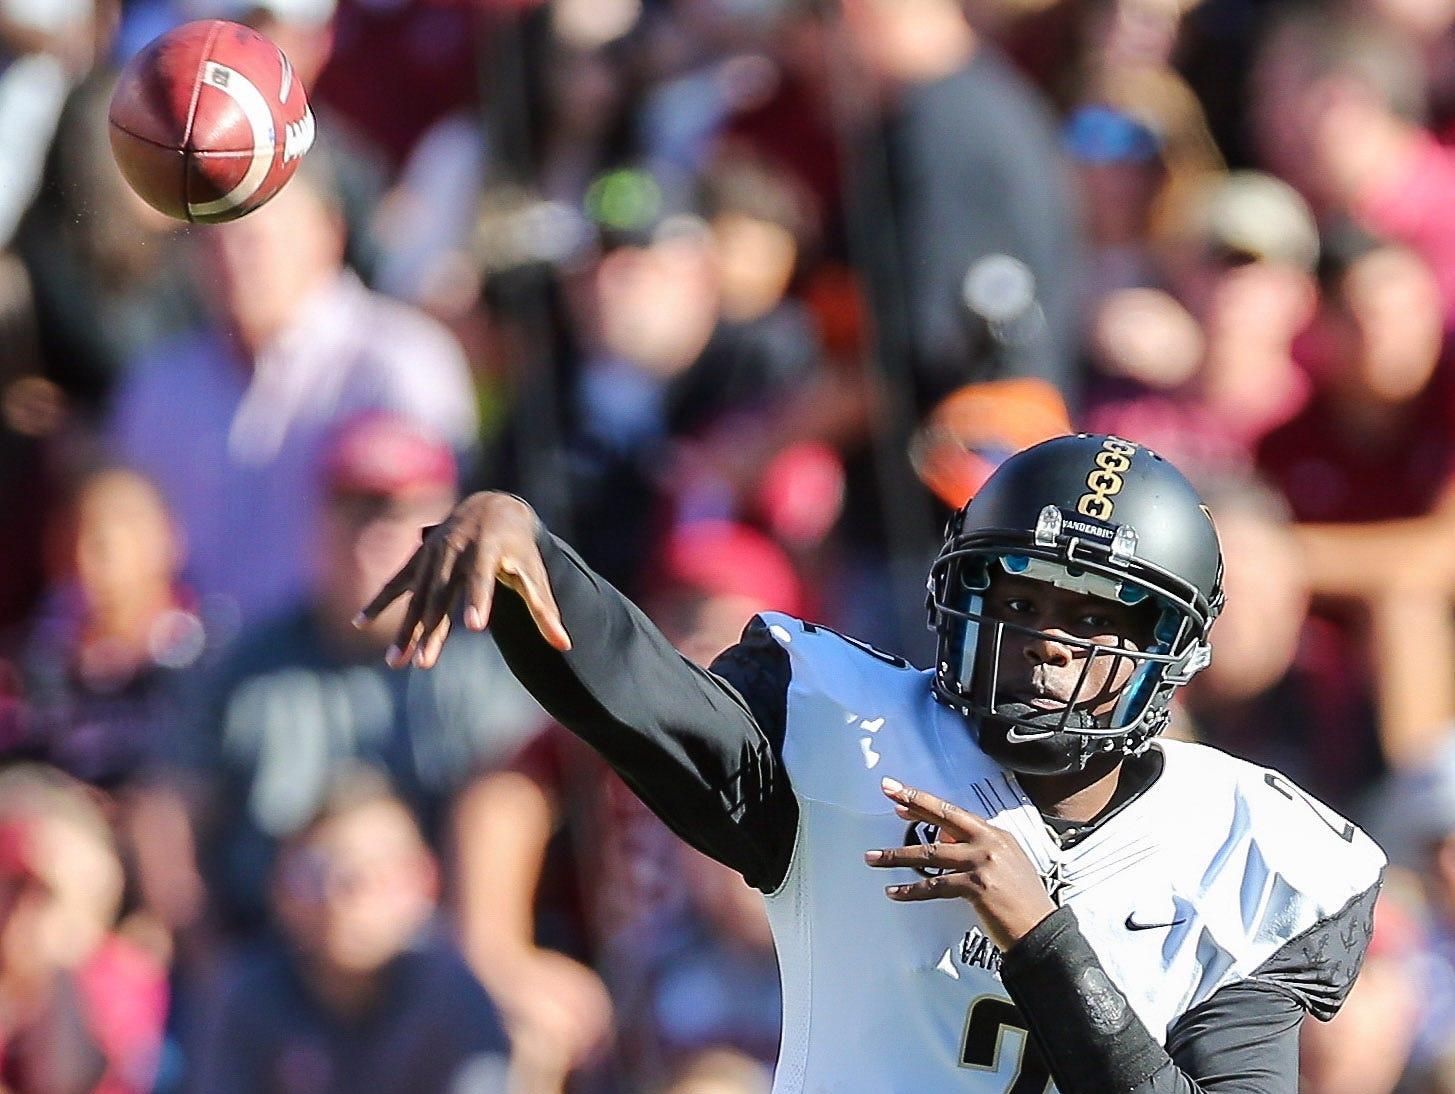 Will Johnny McCrary be Vanderbilt's starting quarterback when the Commodores face Missouri on Saturday? Head coach Derek Mason isn't ready to confirm that.